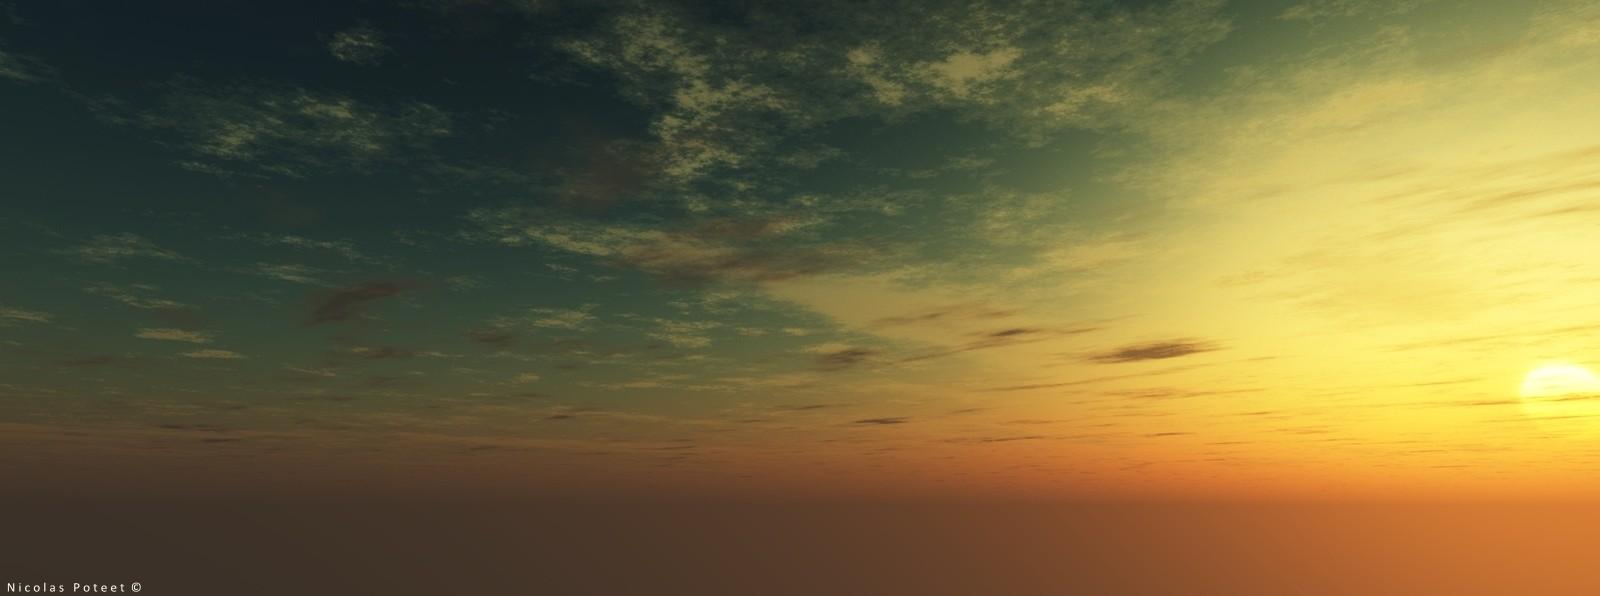 Nicolas_Poteet_Paysages.12